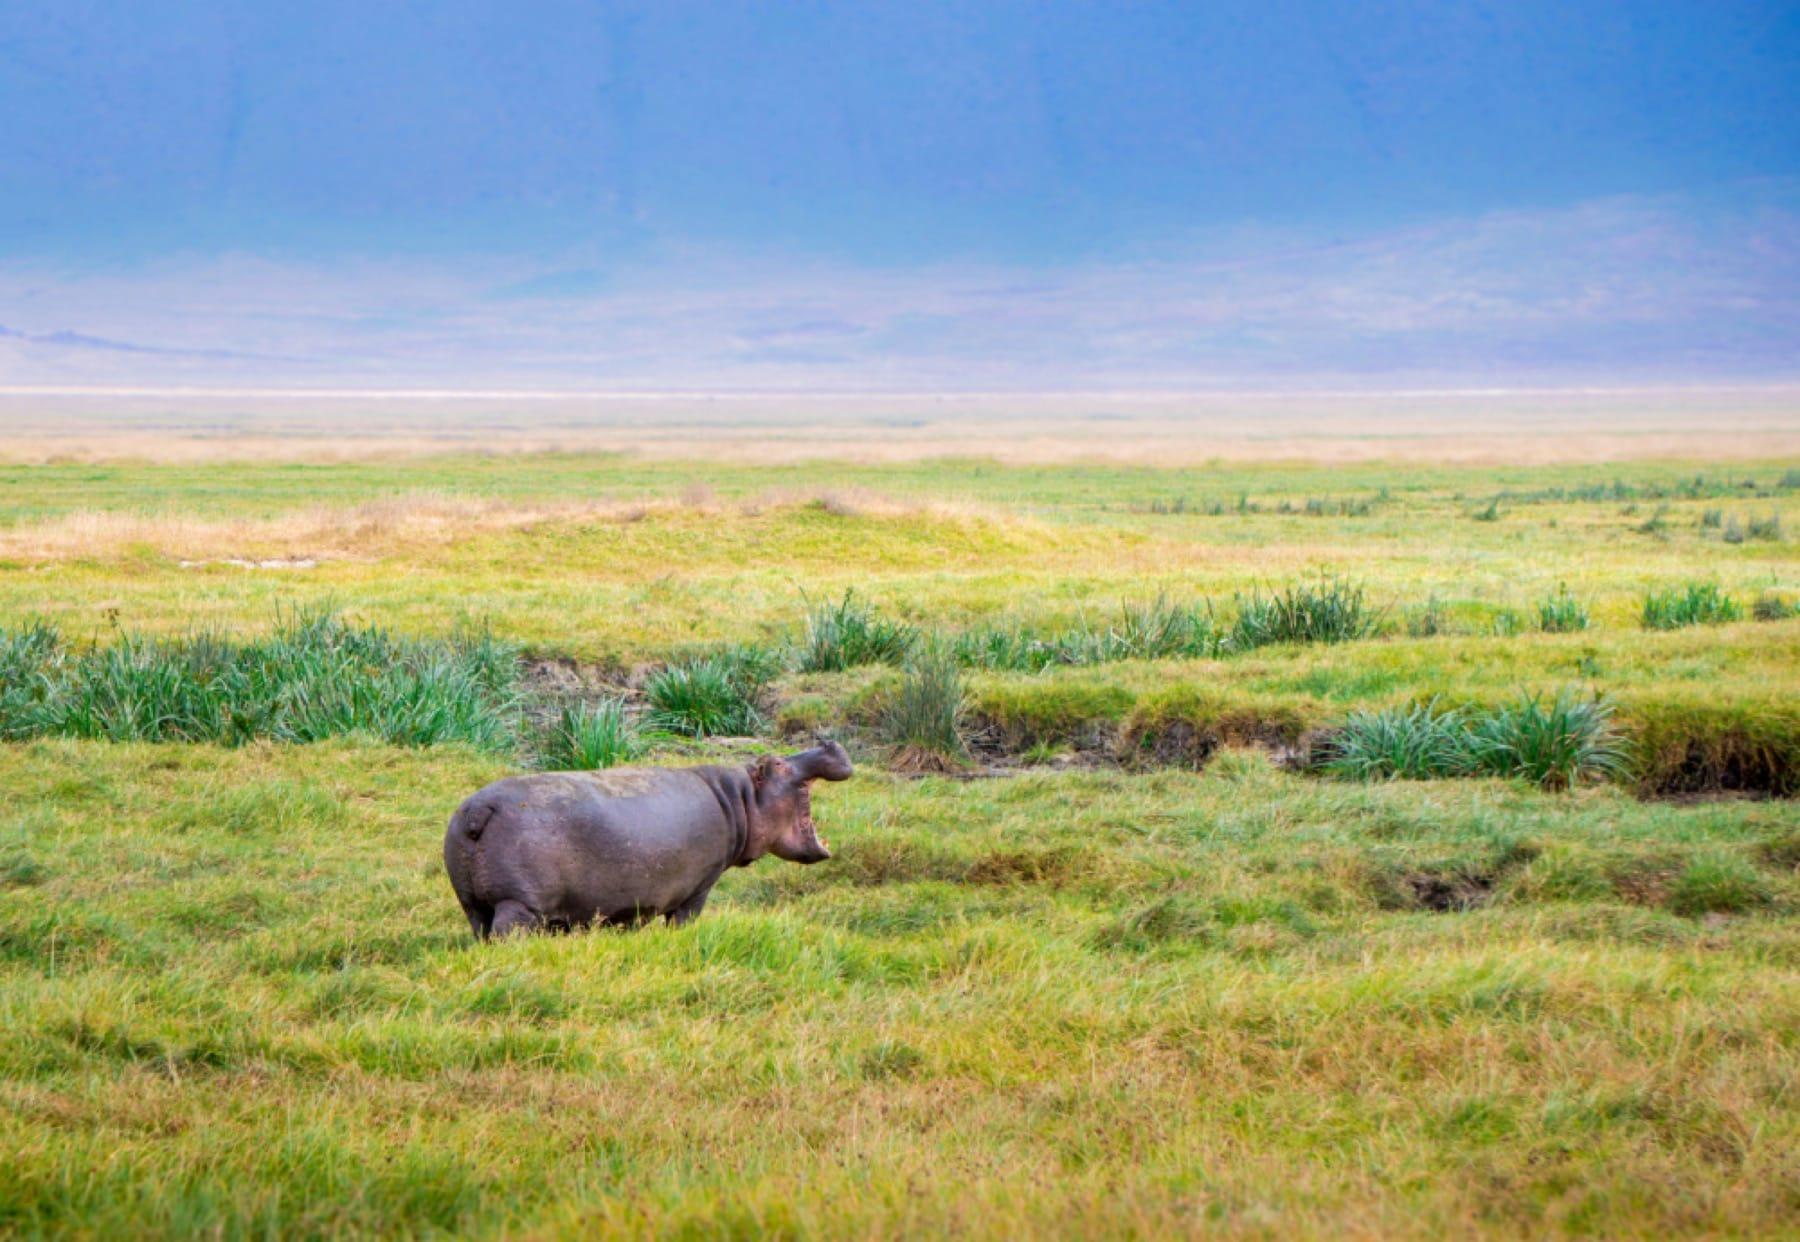 hippo wildlife ngorongoro crater tanzania safari